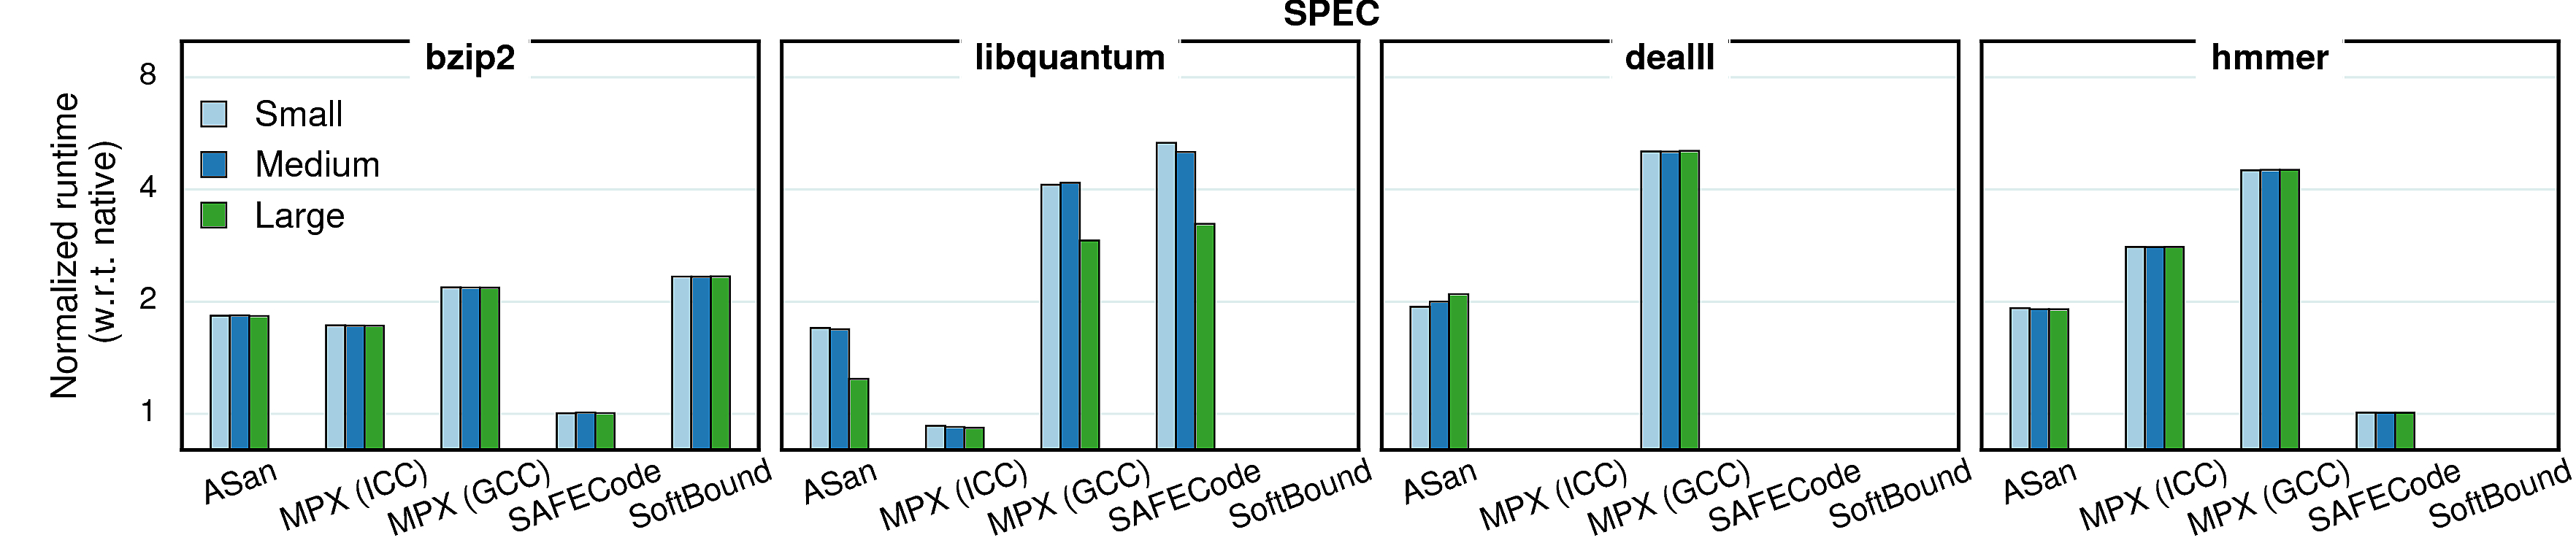 Varying inputs - performance (SPEC)